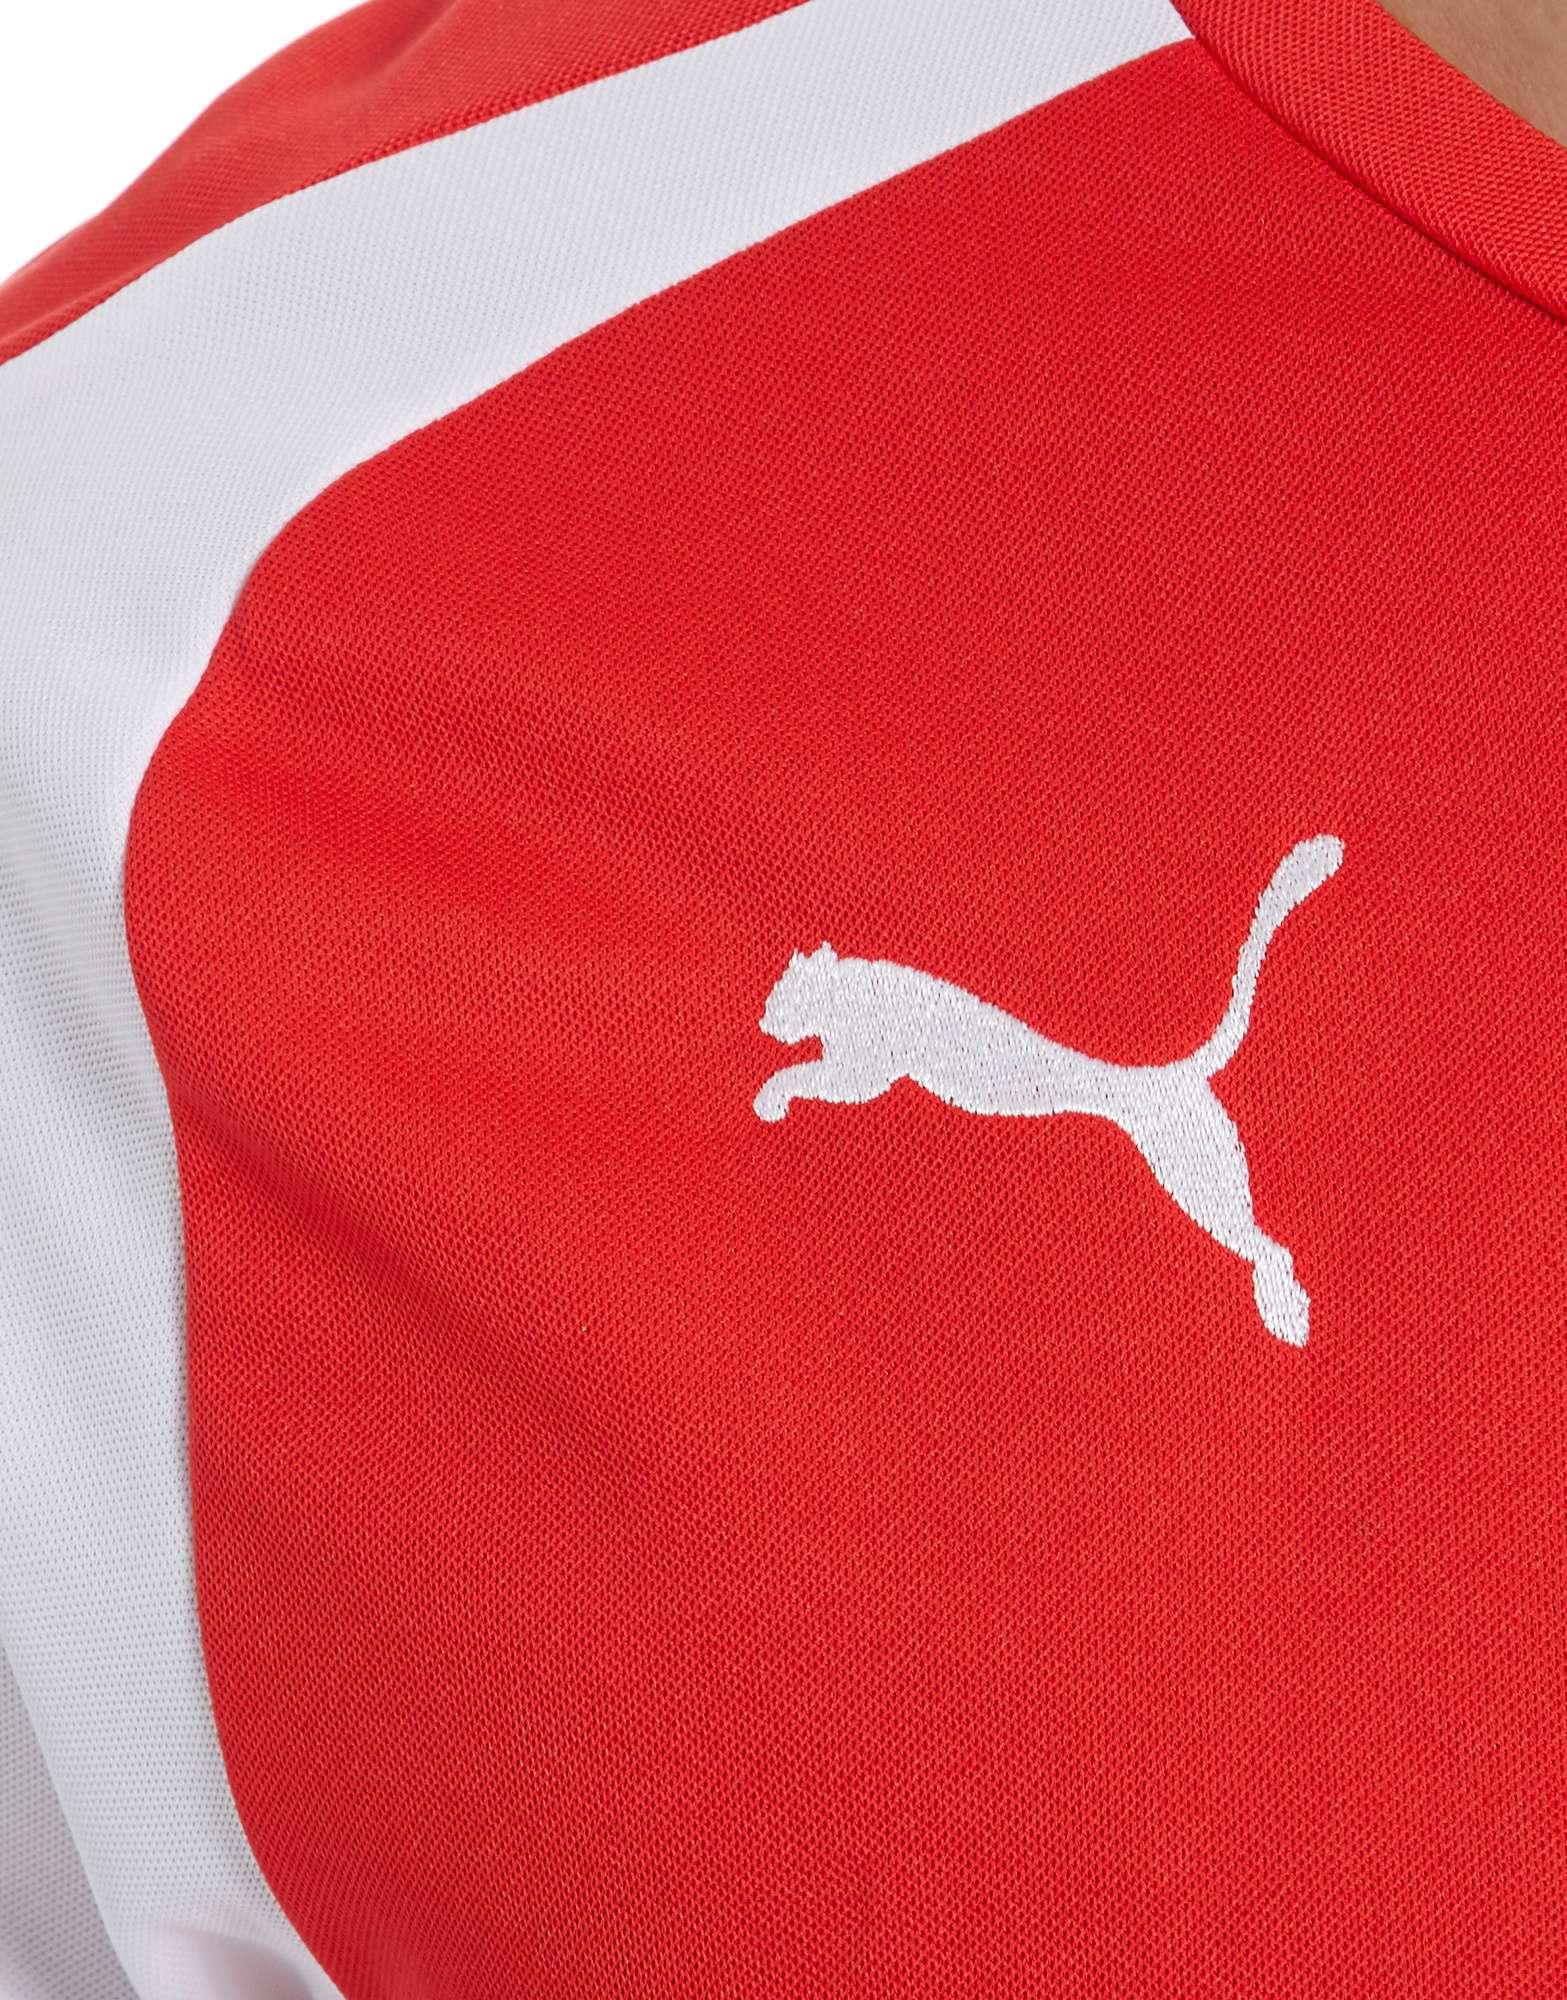 PUMA Arsenal 2014 Home Shirt